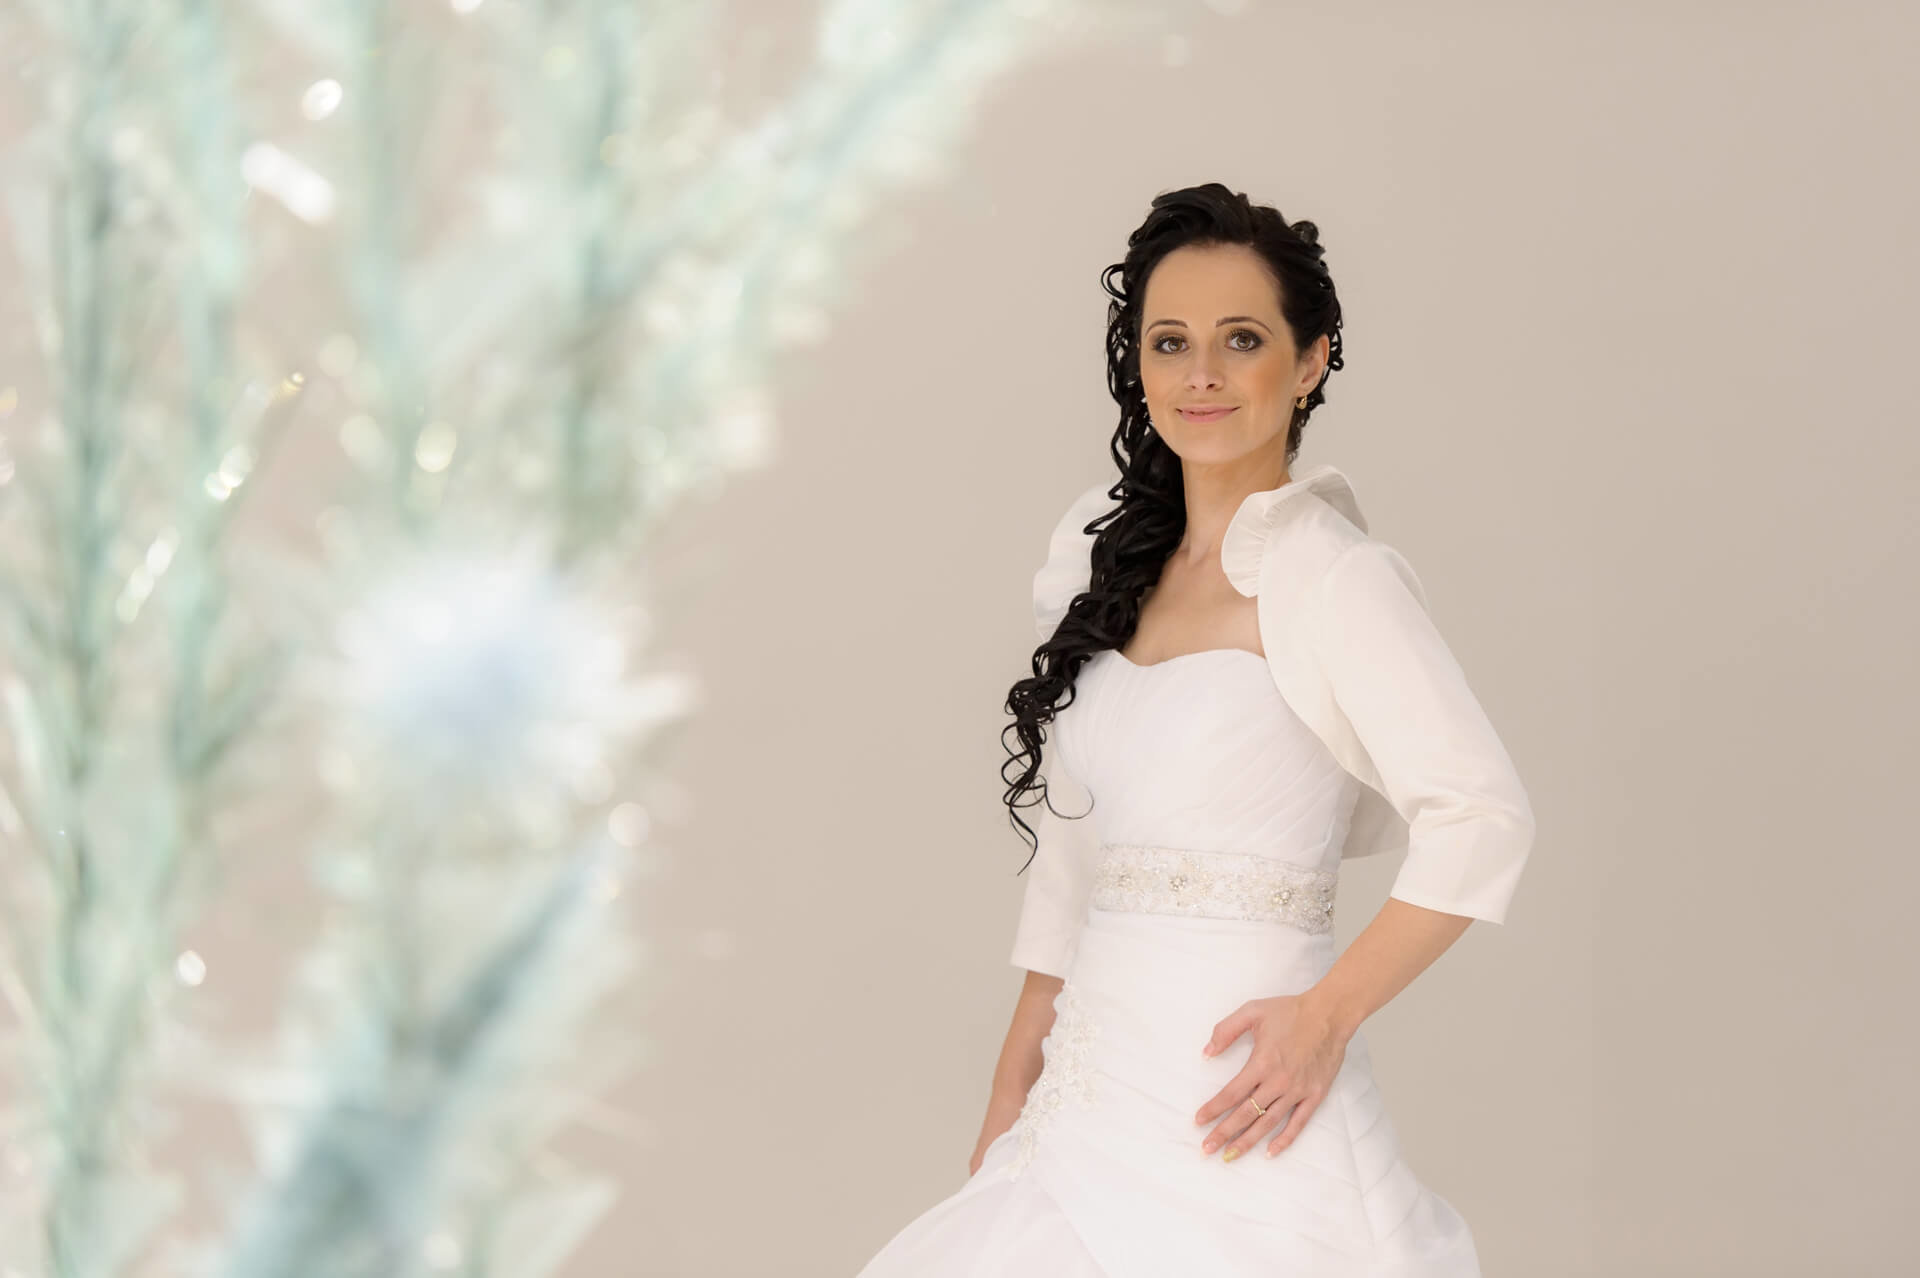 svadba svadobny portrety profesionalne fotenie fotograf Peter Norulak Kosice__34